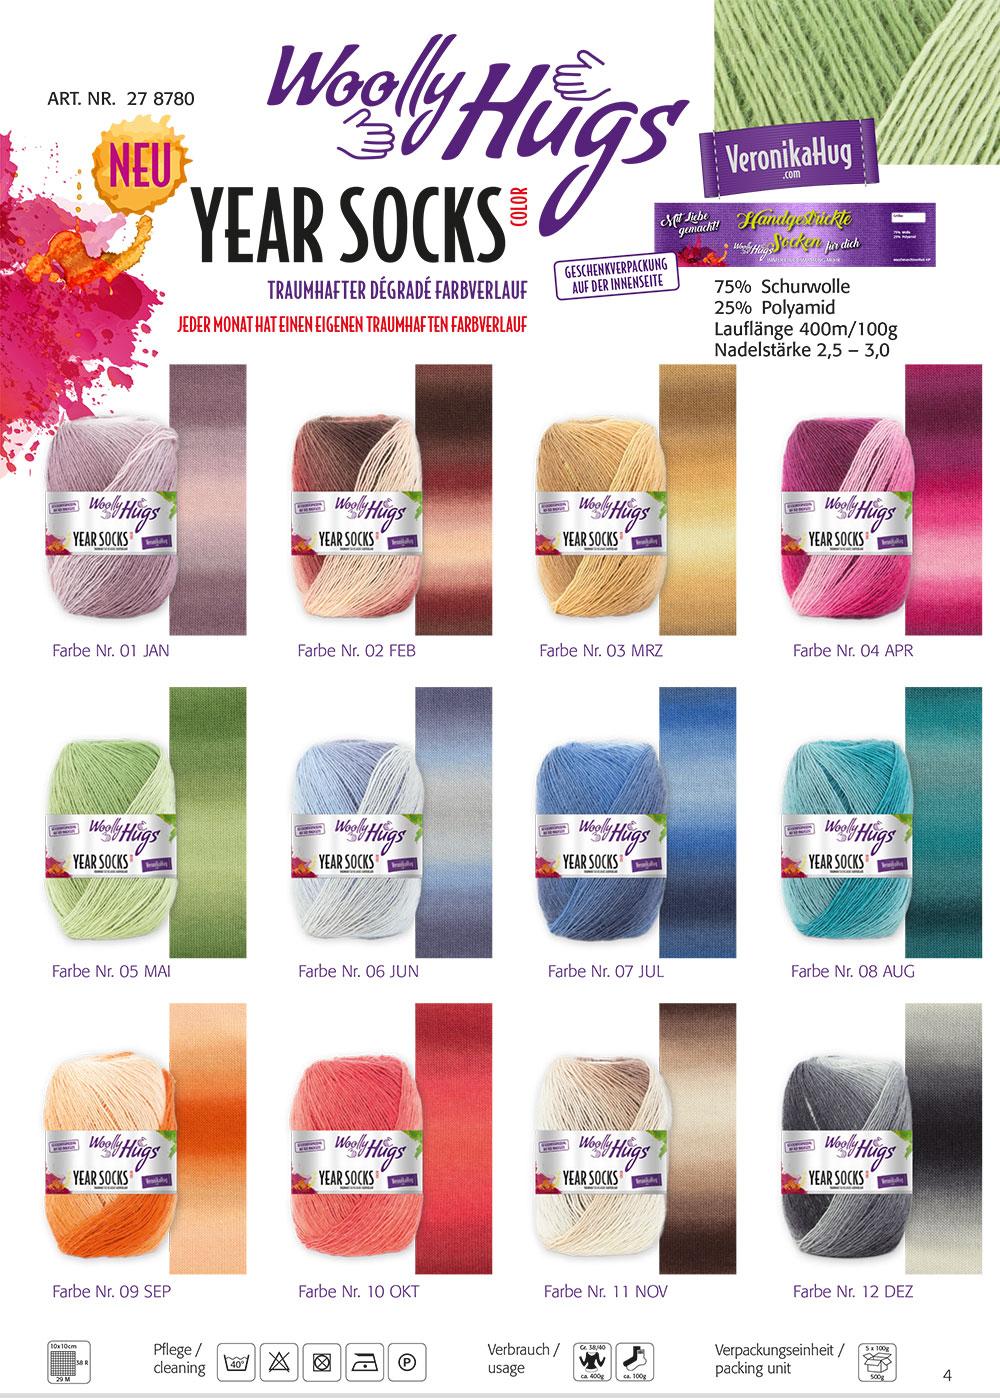 X Year Socks